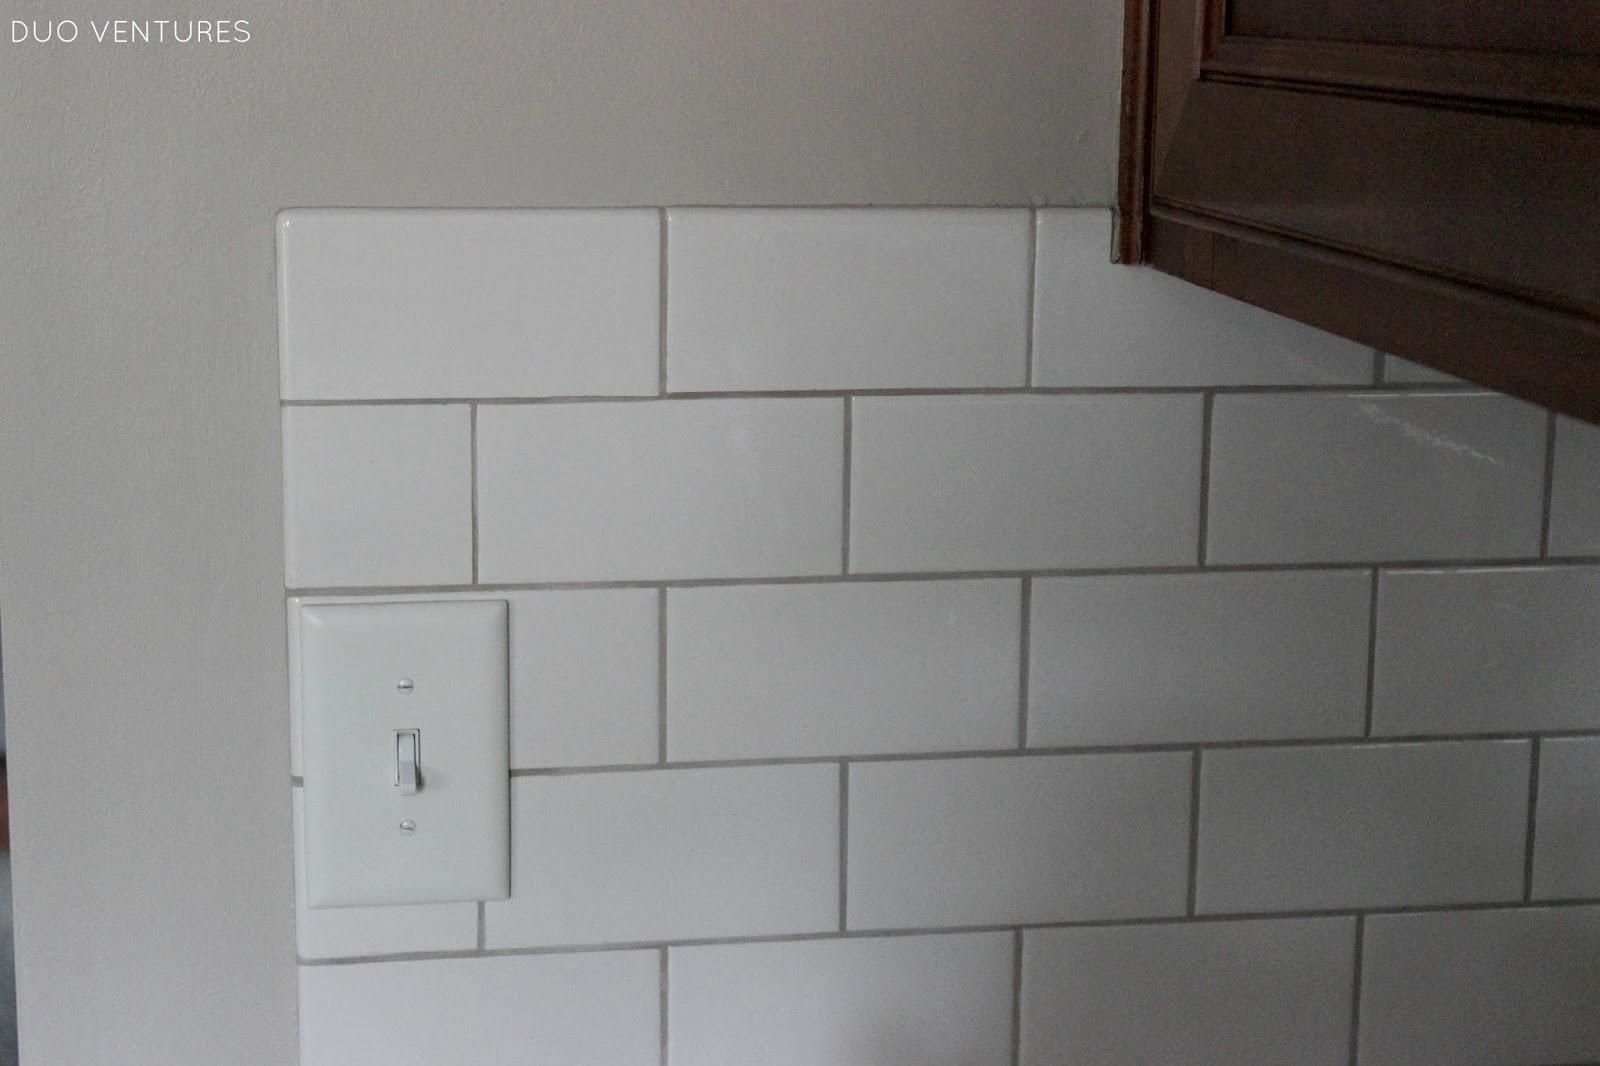 Mexican Ceramic Tile Backsplash Around The